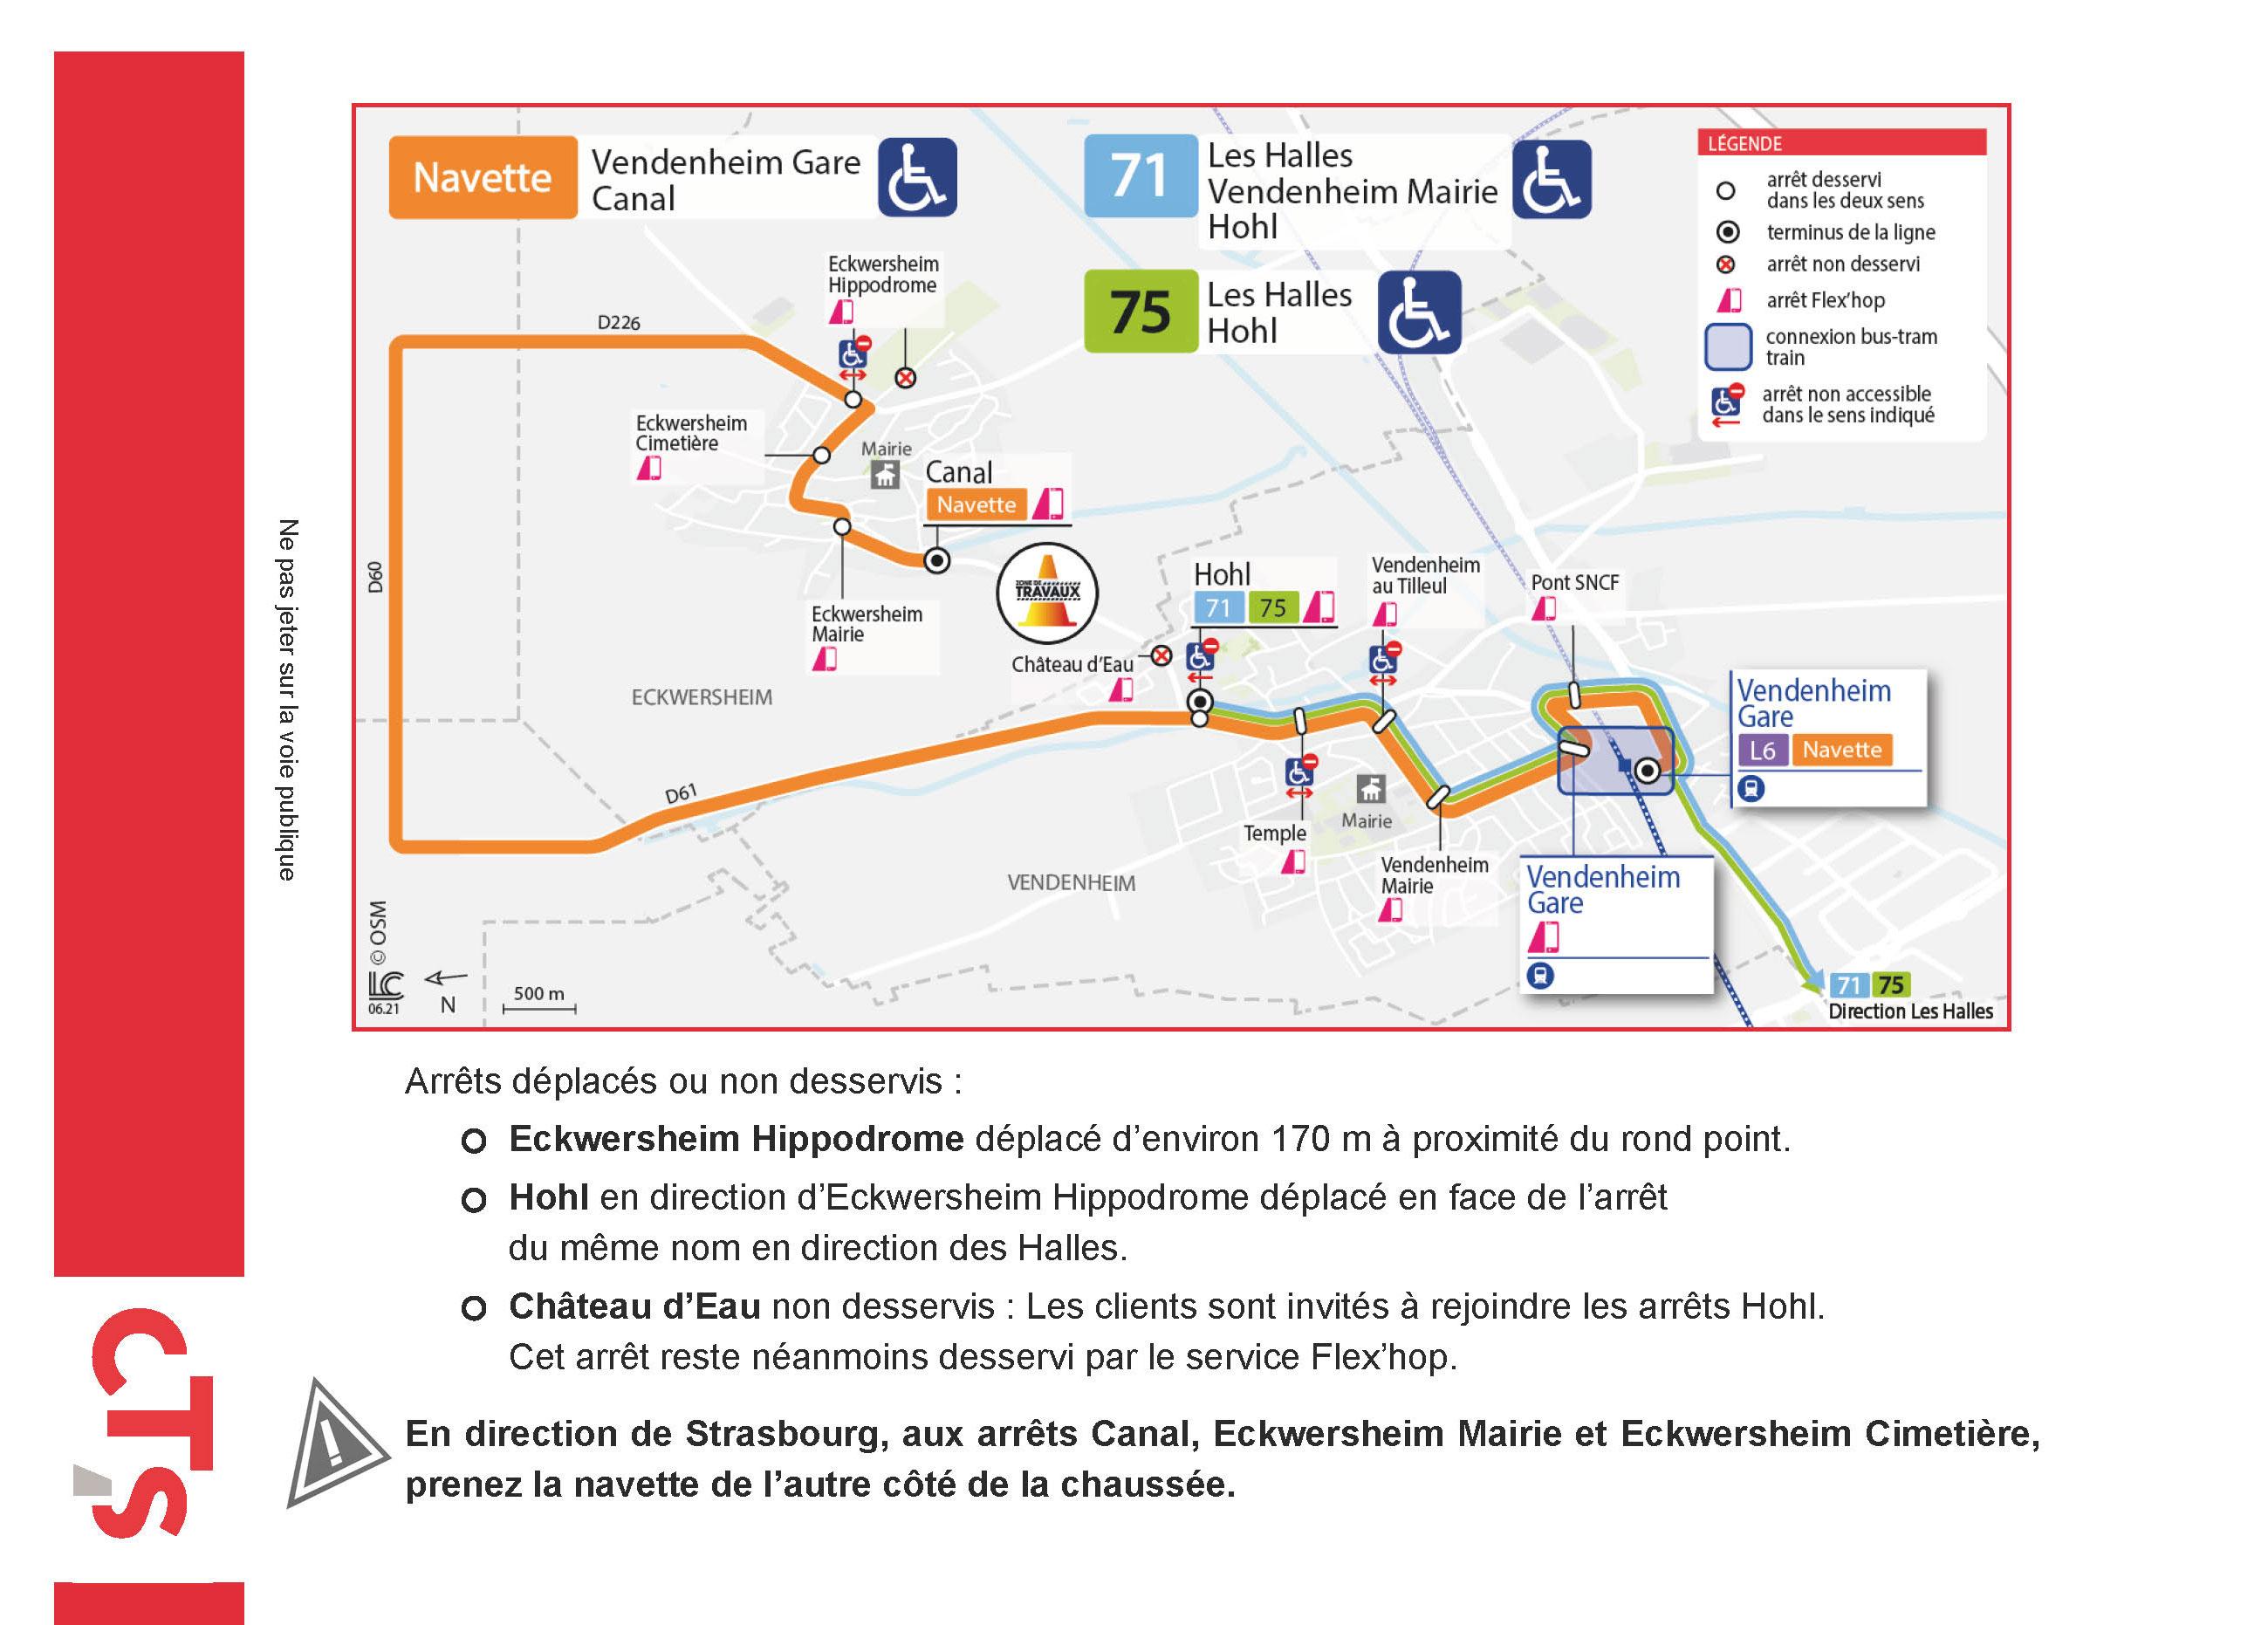 Leaflet-travaux-RD-226-entre-Vendenheim-et-Eckwersheim-A4-1806_Page_2